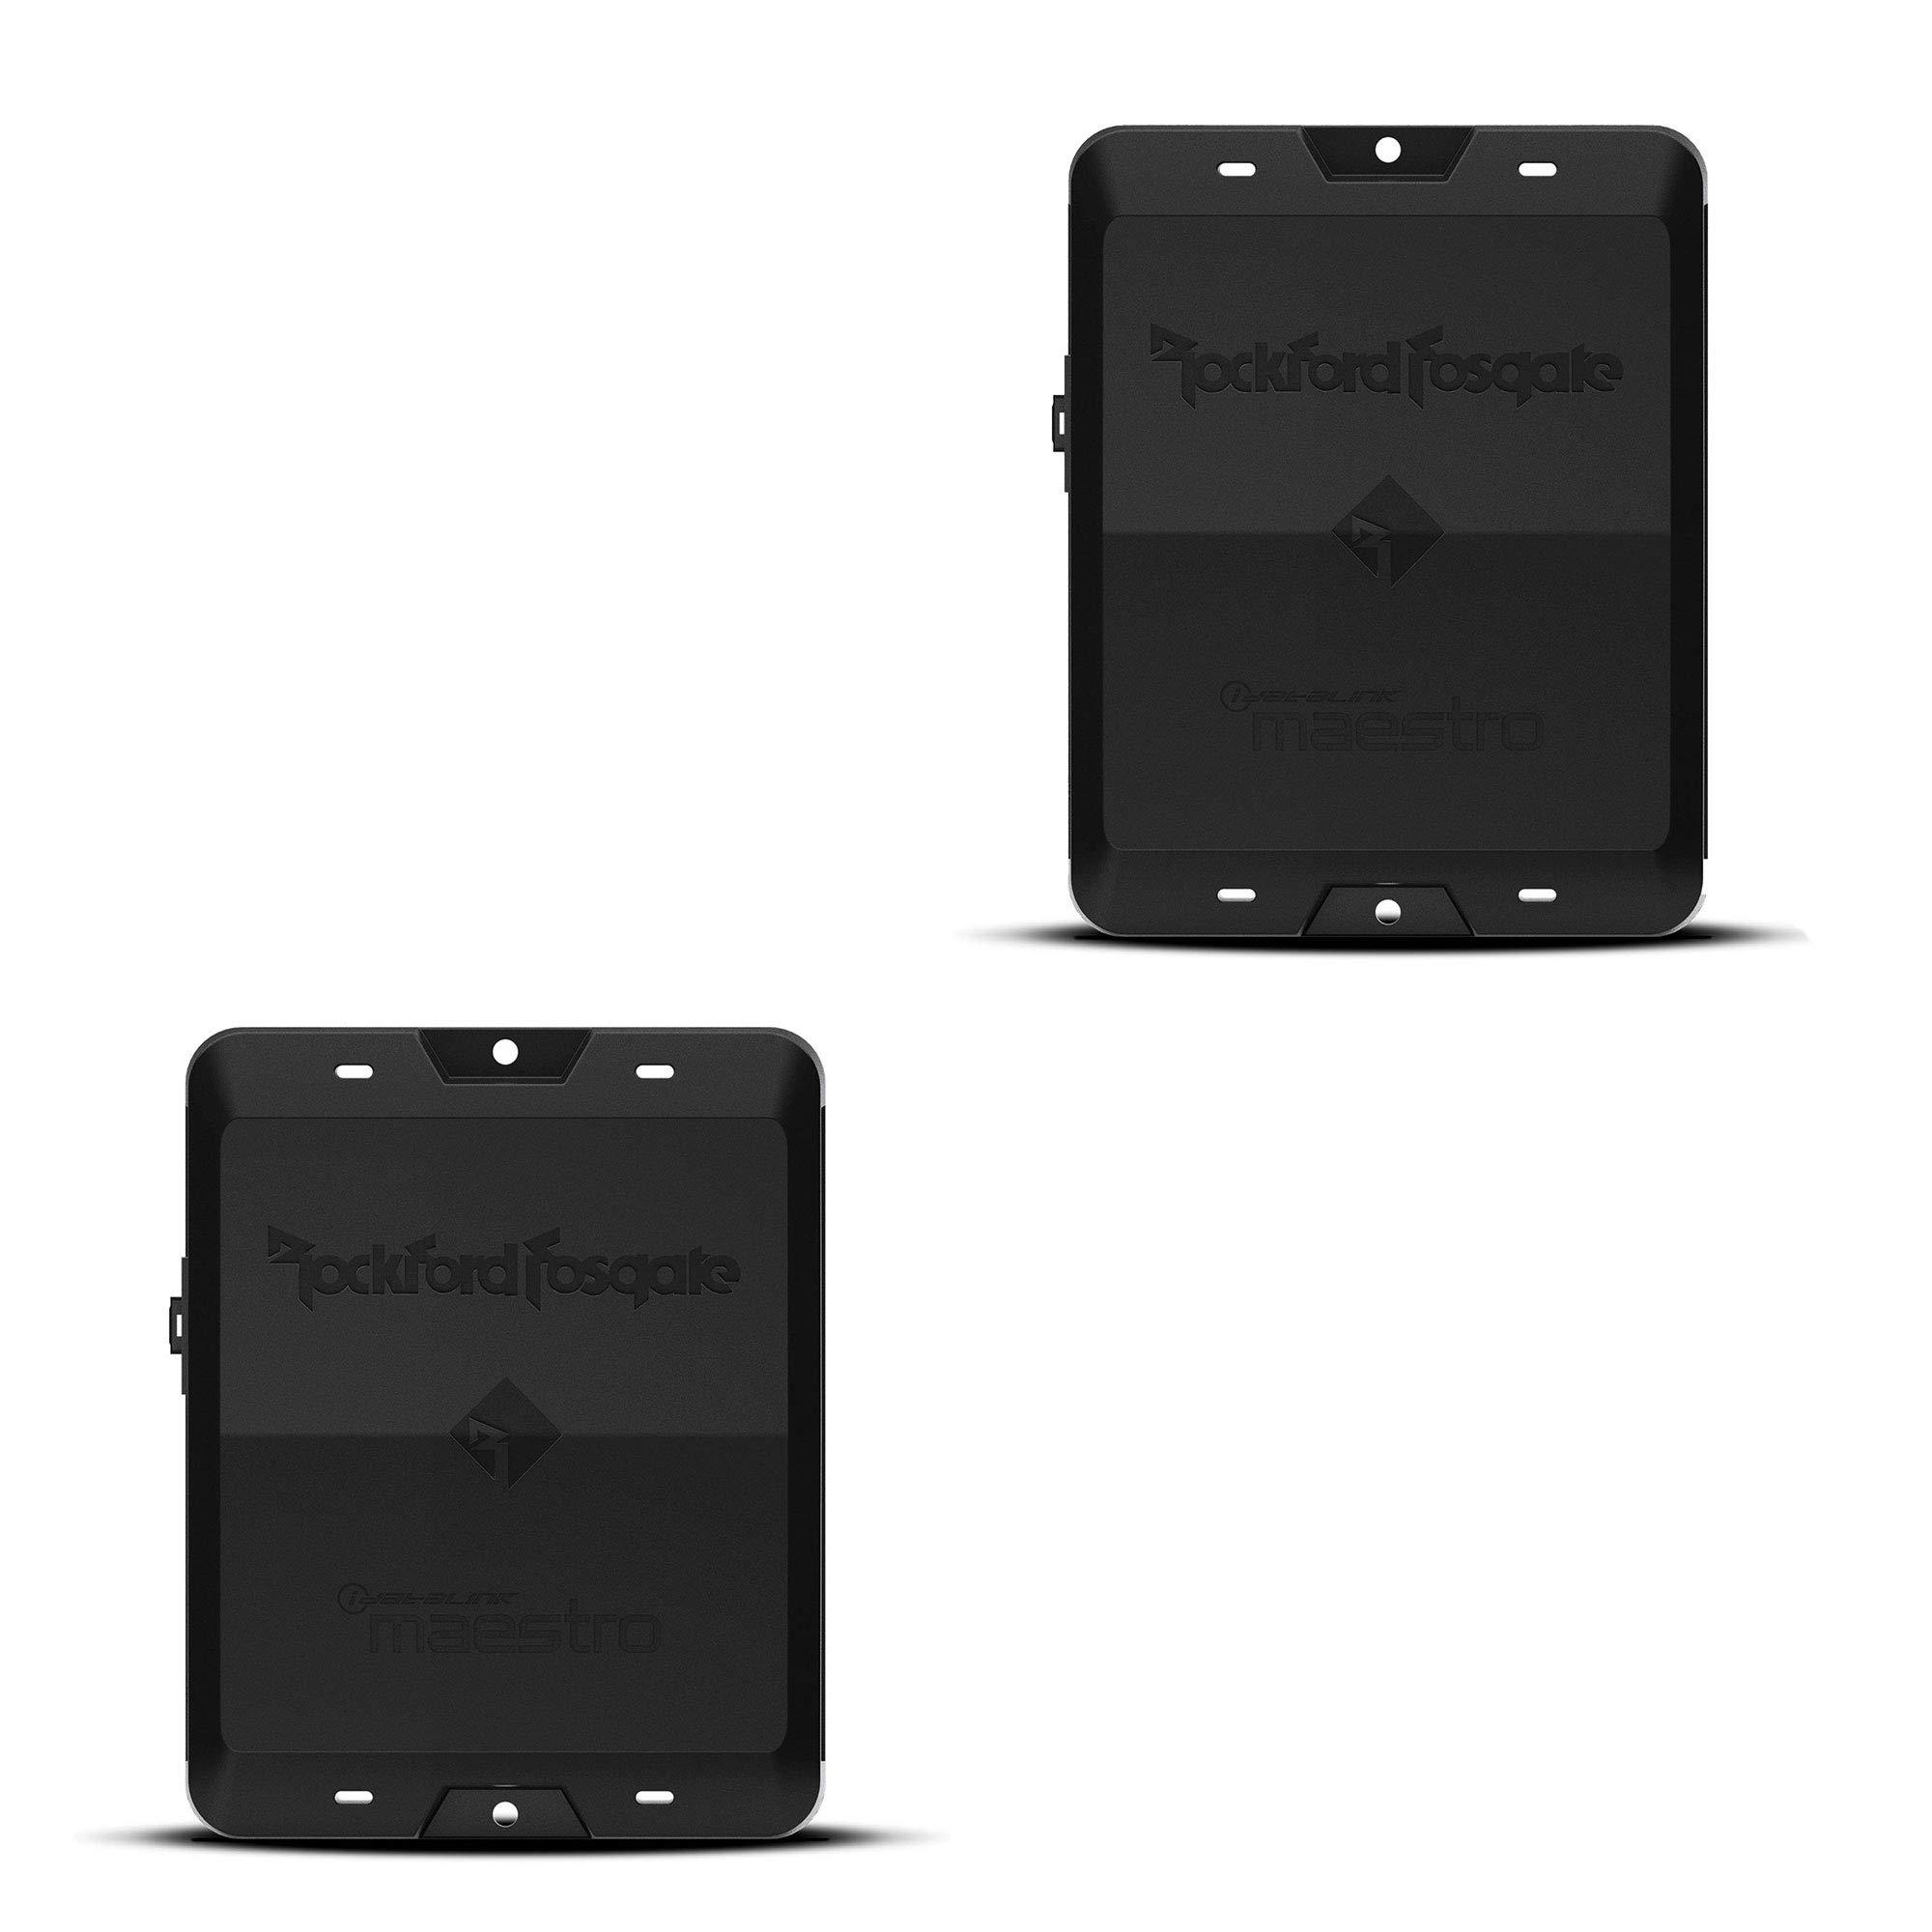 Rockford Fosgate DSR1 8 Channel Interactive iDatalink Maestro Signal Processor (2 Pack) by Rockford Fosgate